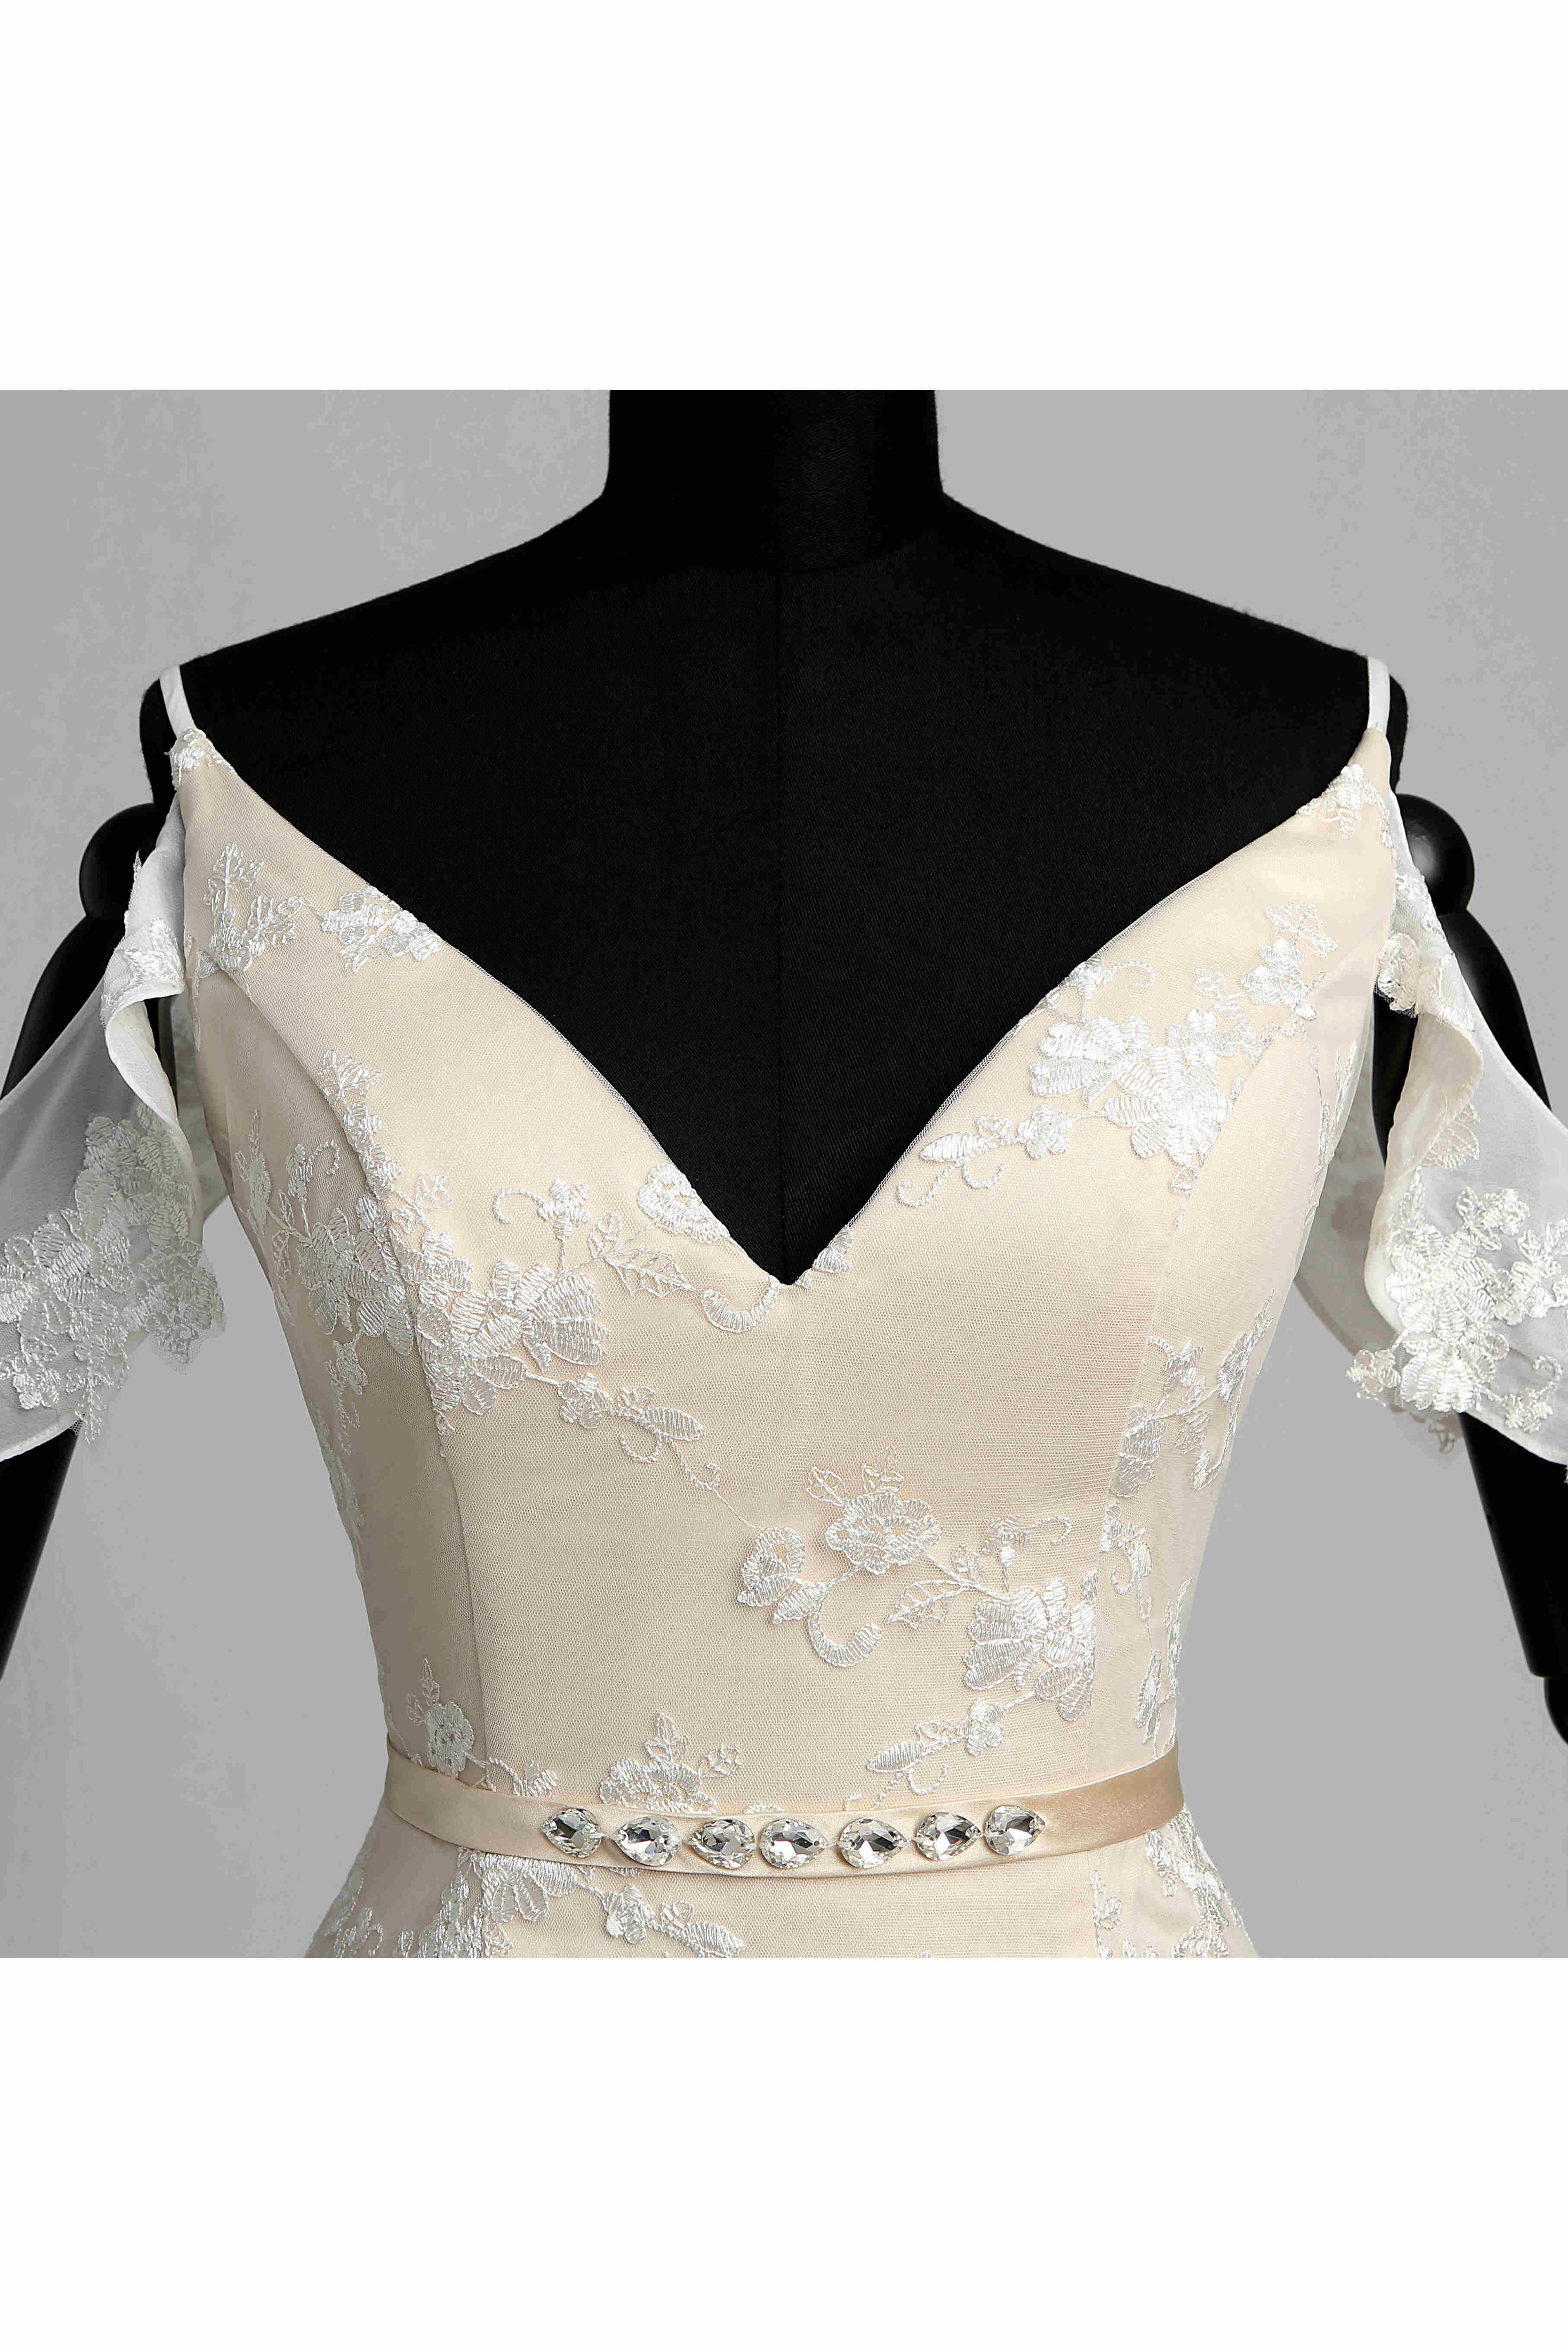 Mermaid trumpet celebrity tshirt short sleeve wedding dress